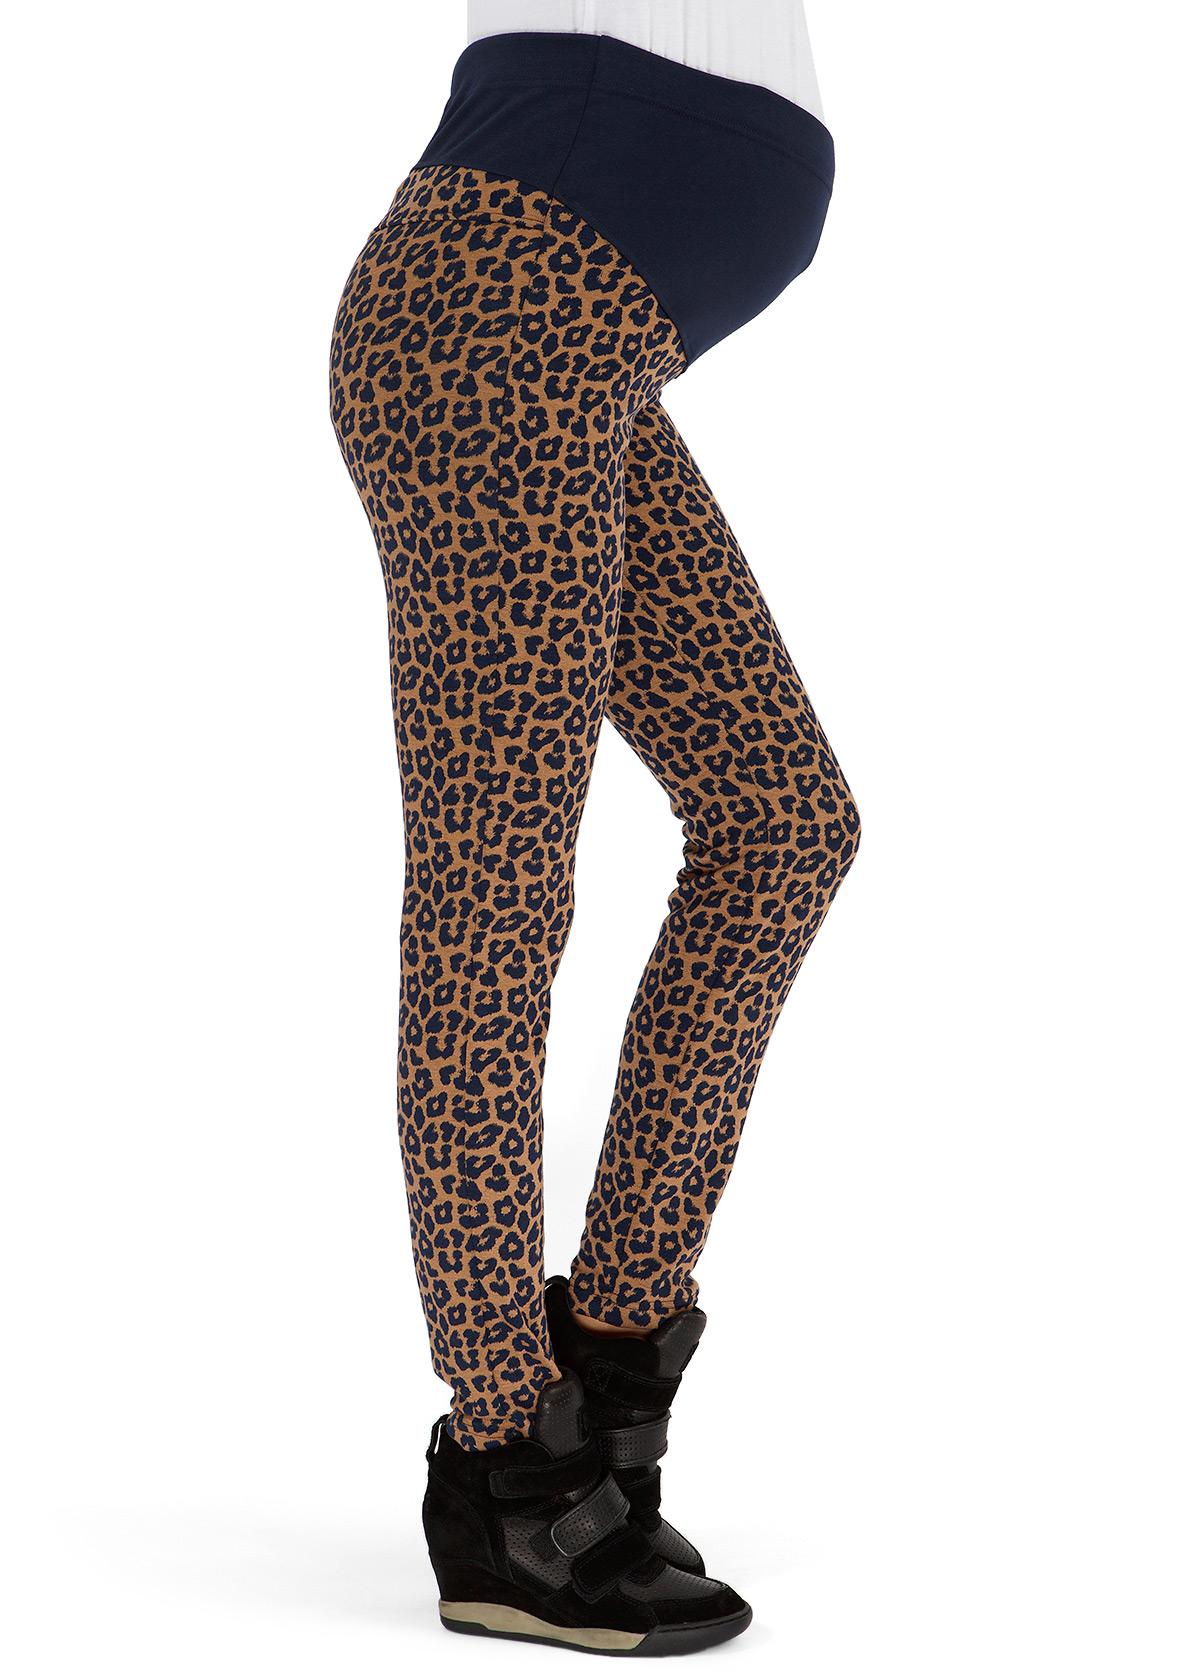 I love mum/scoro/ilm_legginsi_dghein_leopard13.jpg